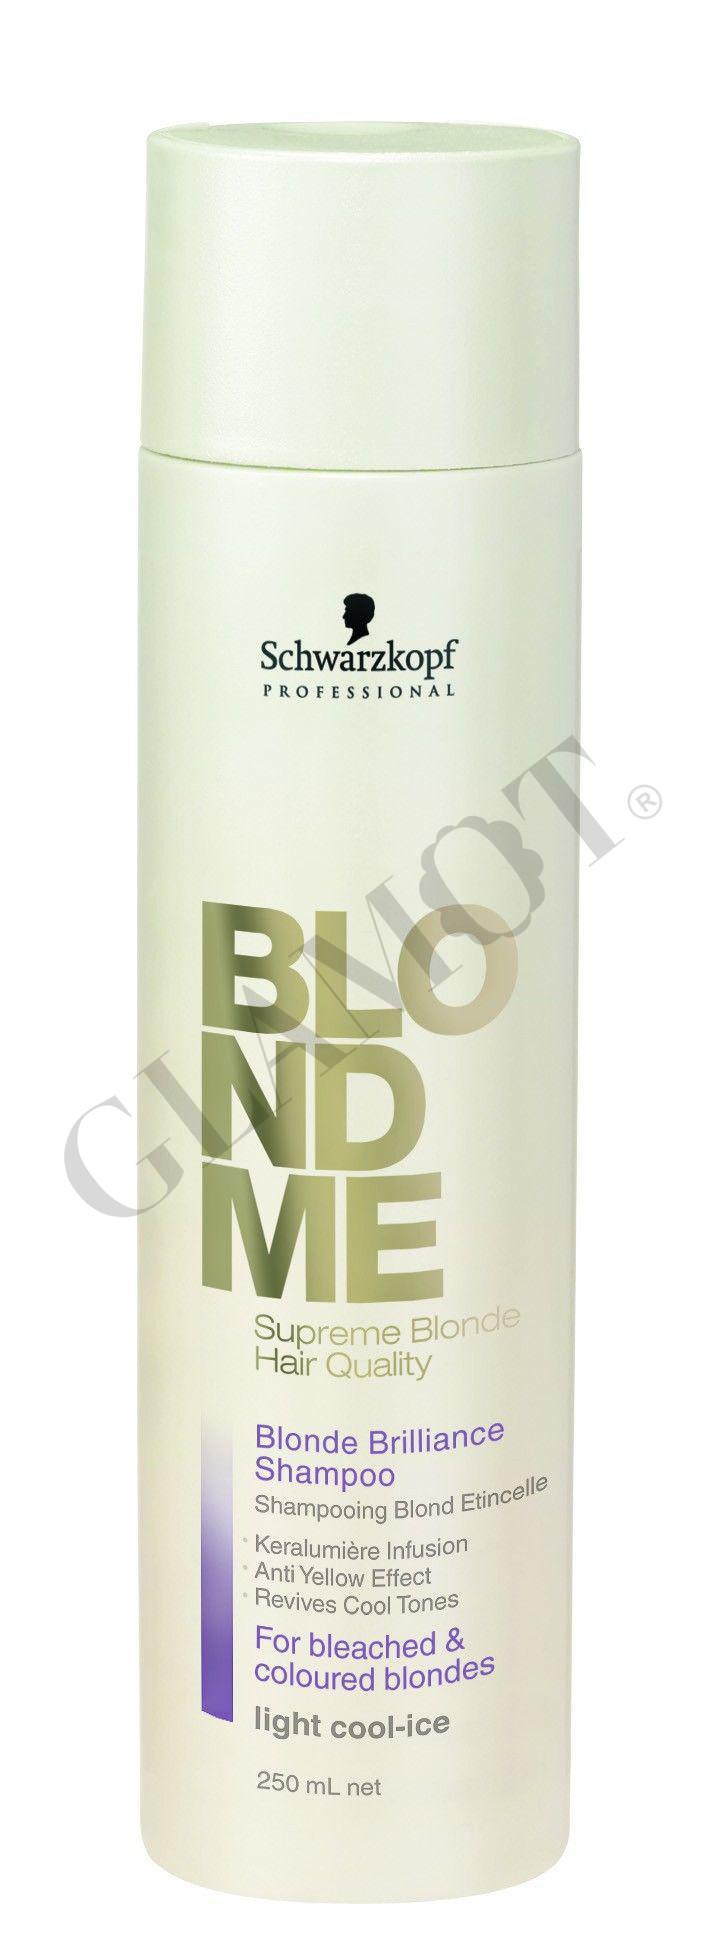 schwarzkopf blondme blonde brilliance shampoo light cool ice. Black Bedroom Furniture Sets. Home Design Ideas